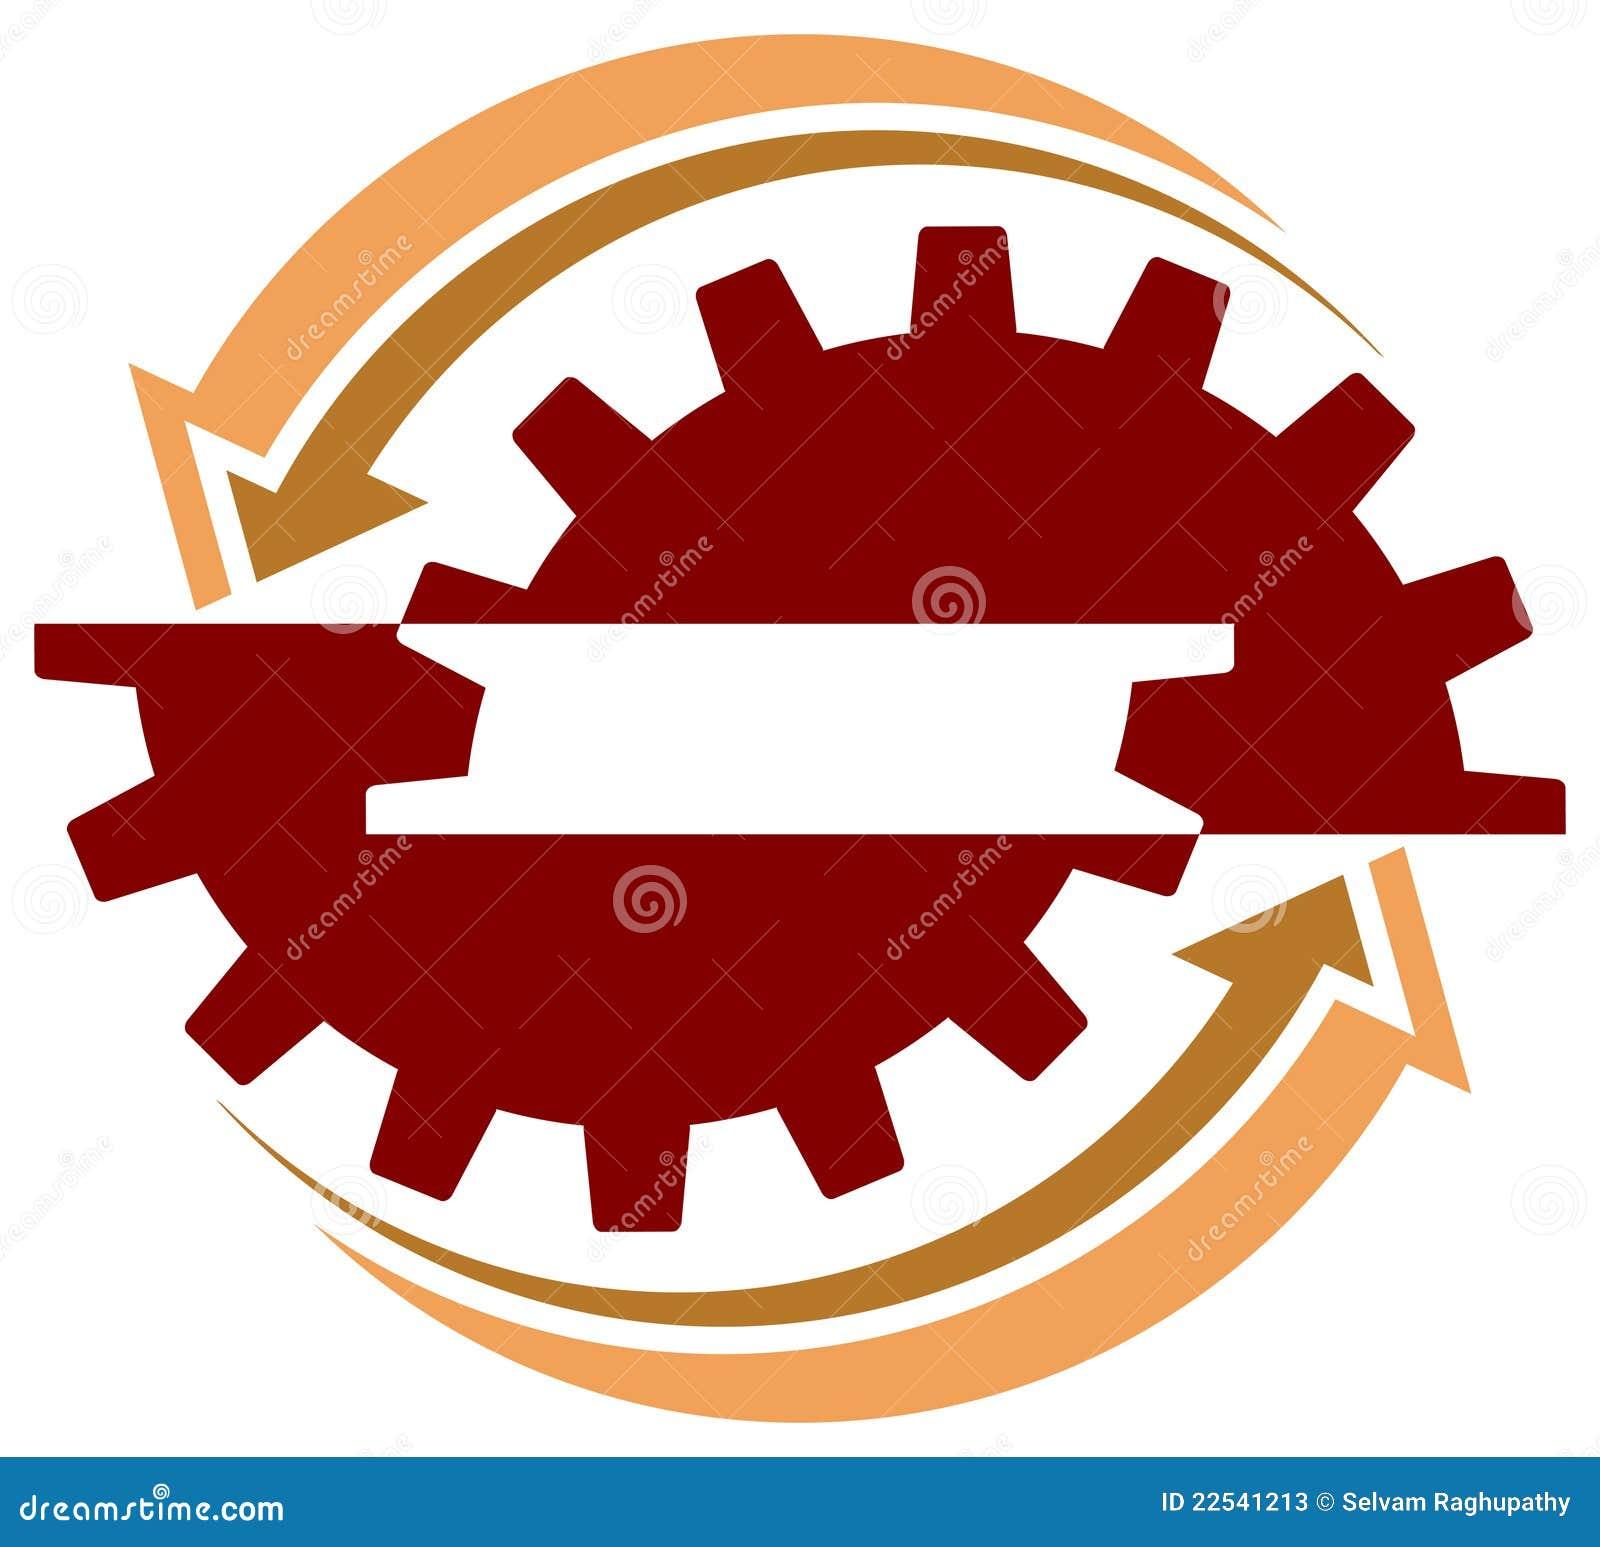 Industrial Logo Stock Photos - Image: 22541213